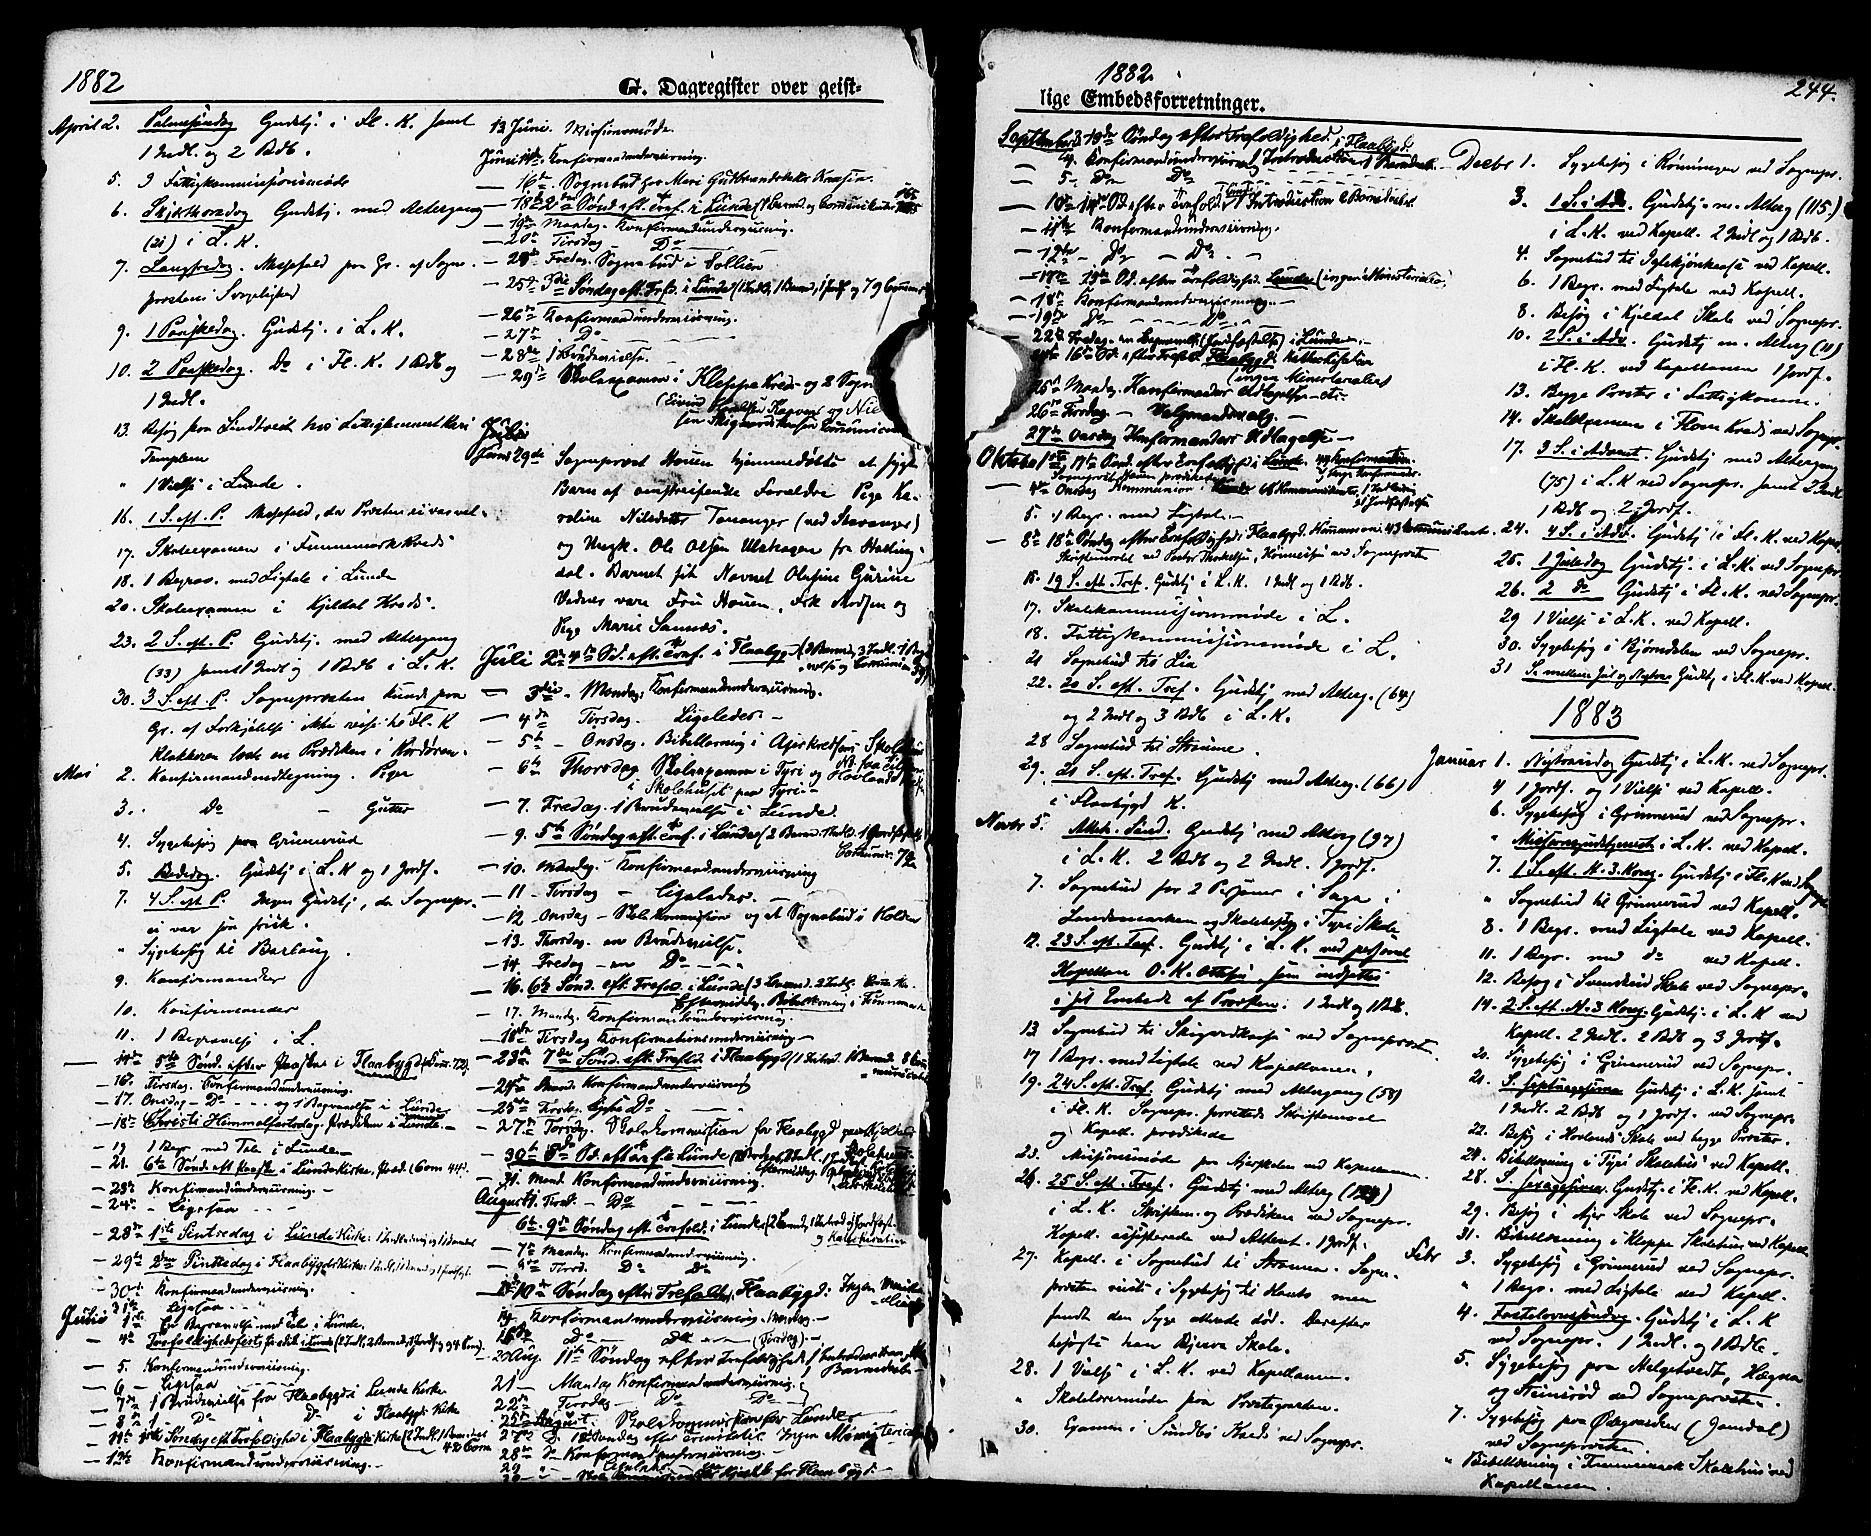 SAKO, Lunde kirkebøker, F/Fa/L0001: Ministerialbok nr. I 1, 1866-1883, s. 244